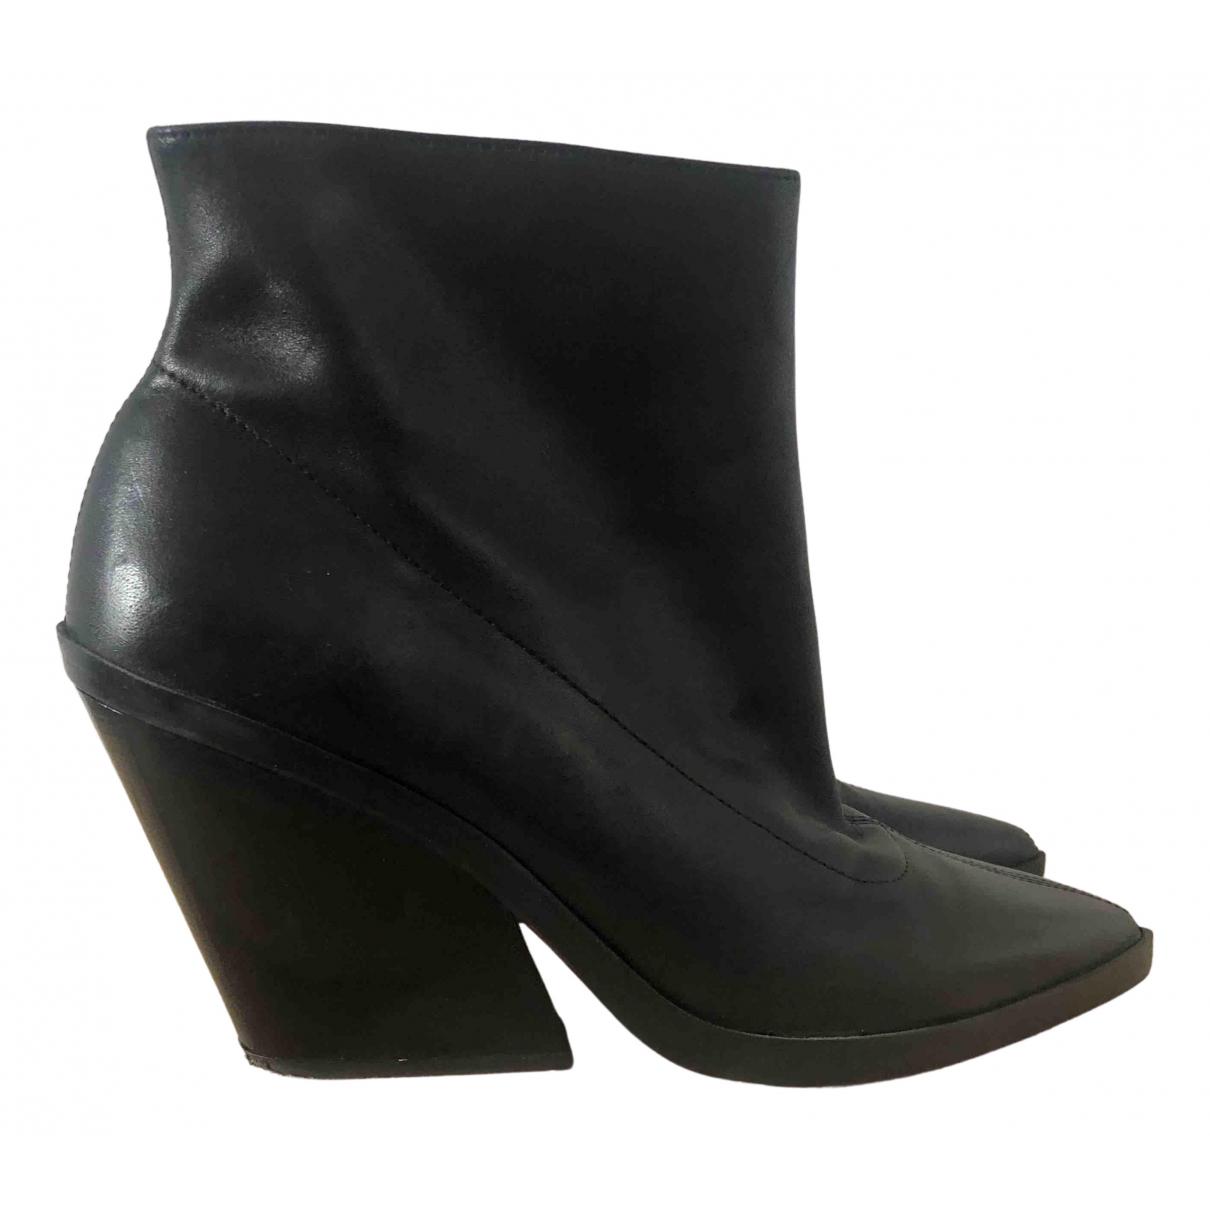 Zara \N Stiefeletten in  Schwarz Leder